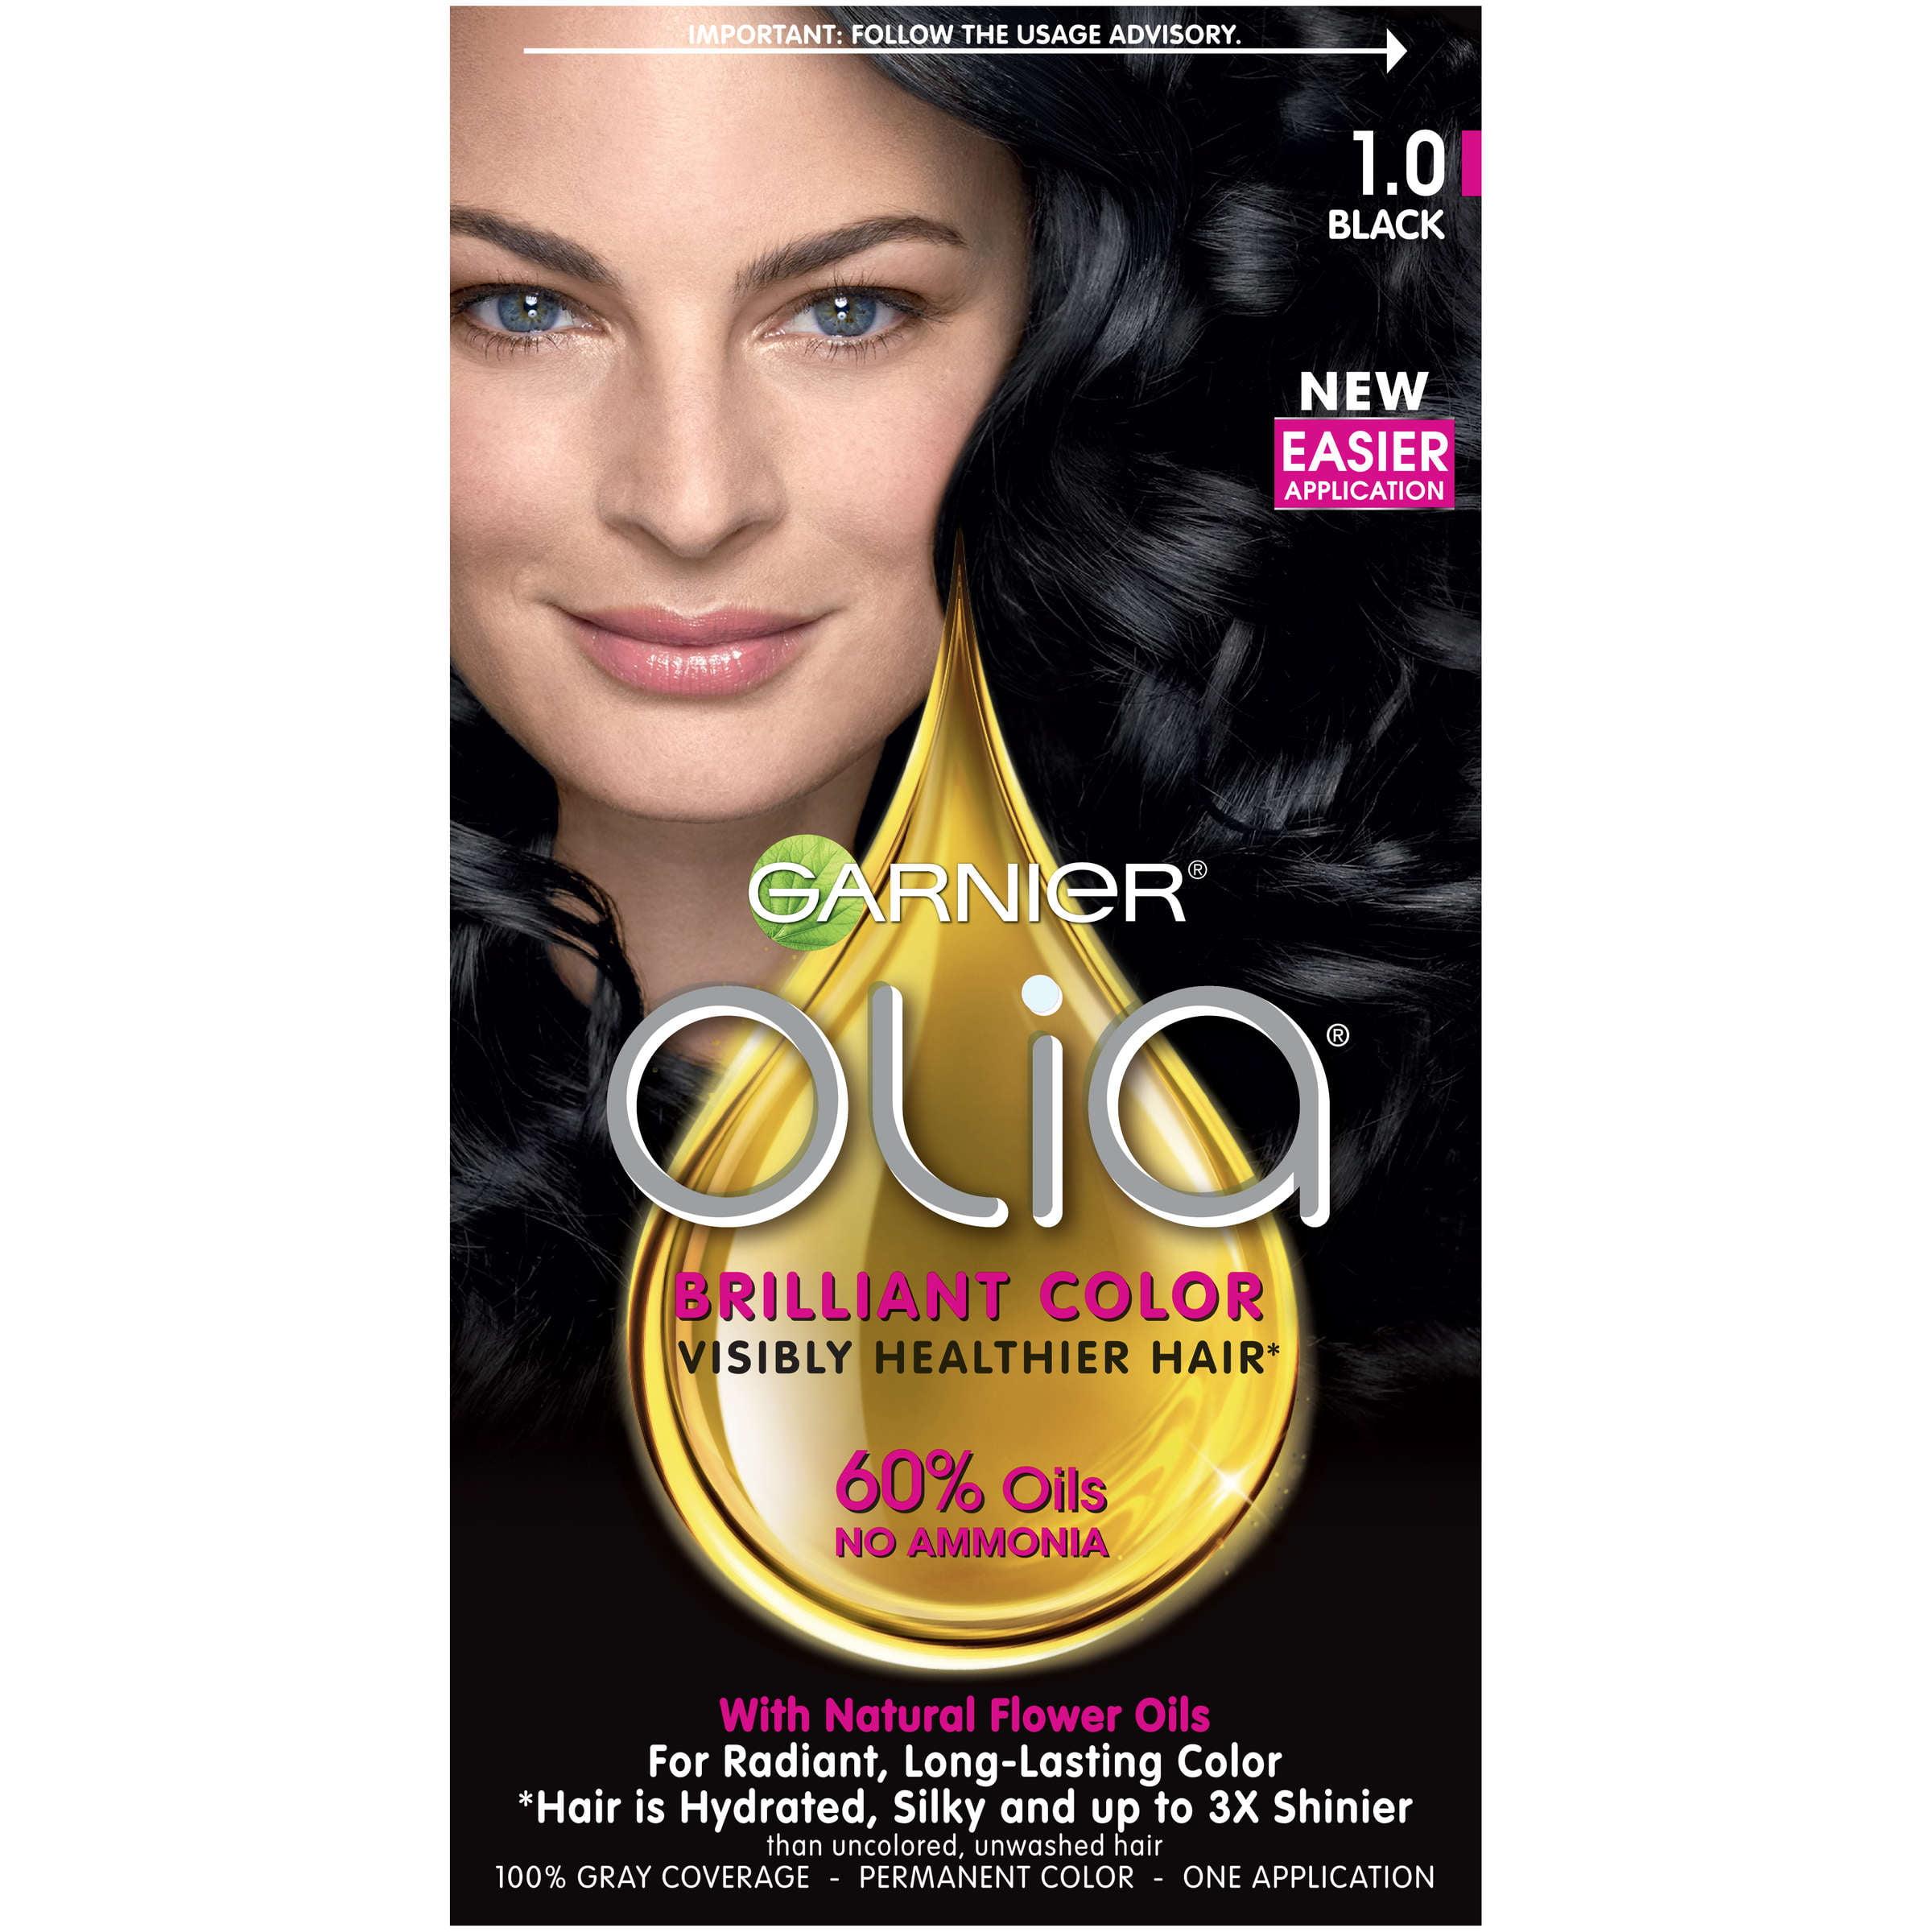 Garnier Olia Oil Powered Permanent Hair Color, 1.0 Black